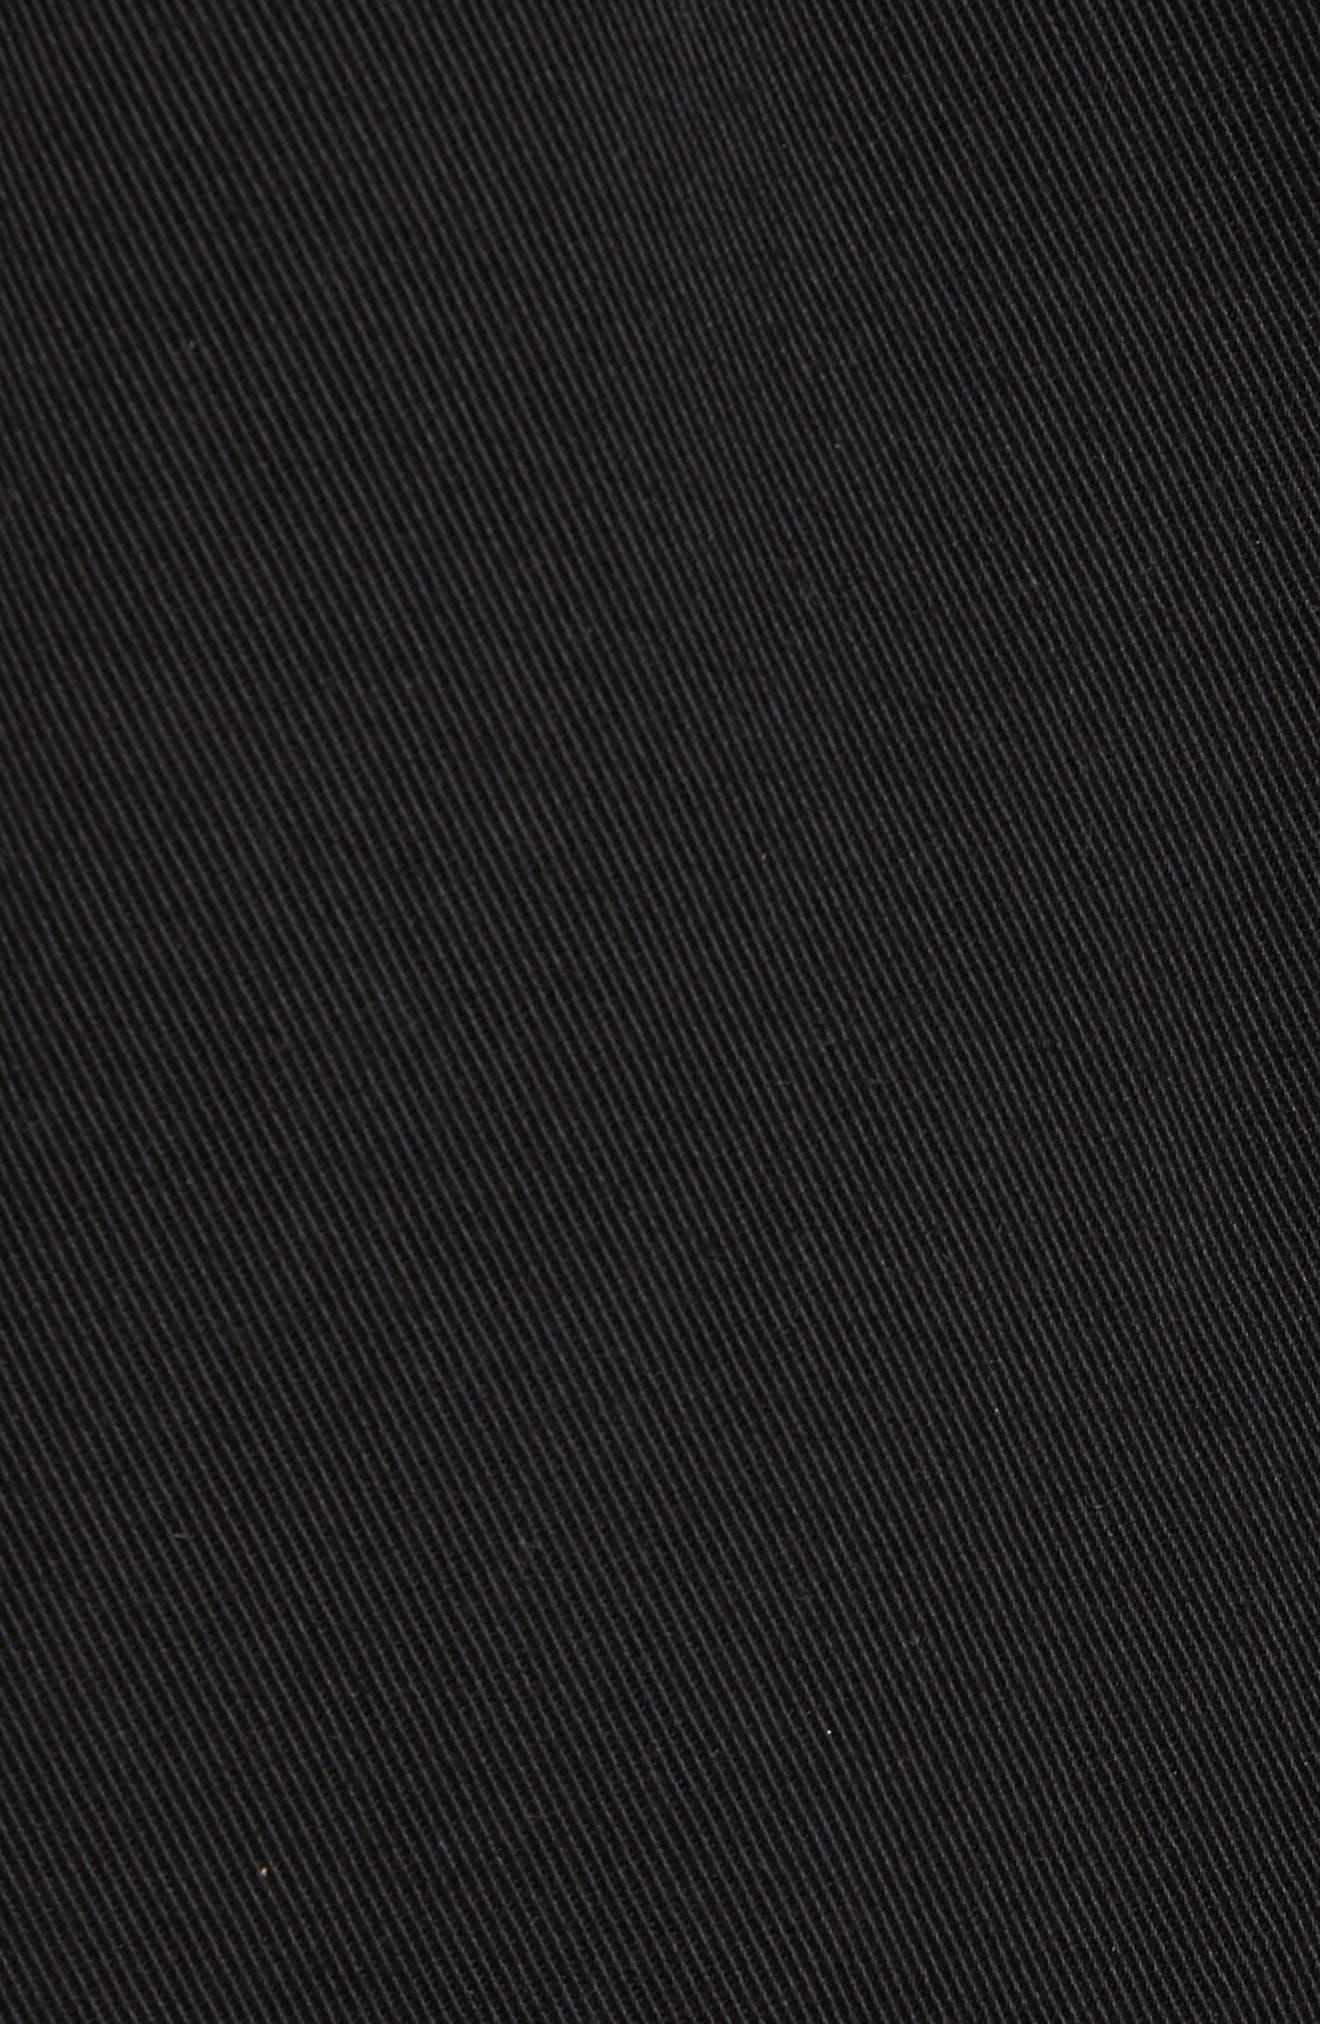 Alec Denim Jacket with Faux Shearling Trim,                             Alternate thumbnail 5, color,                             Blackout